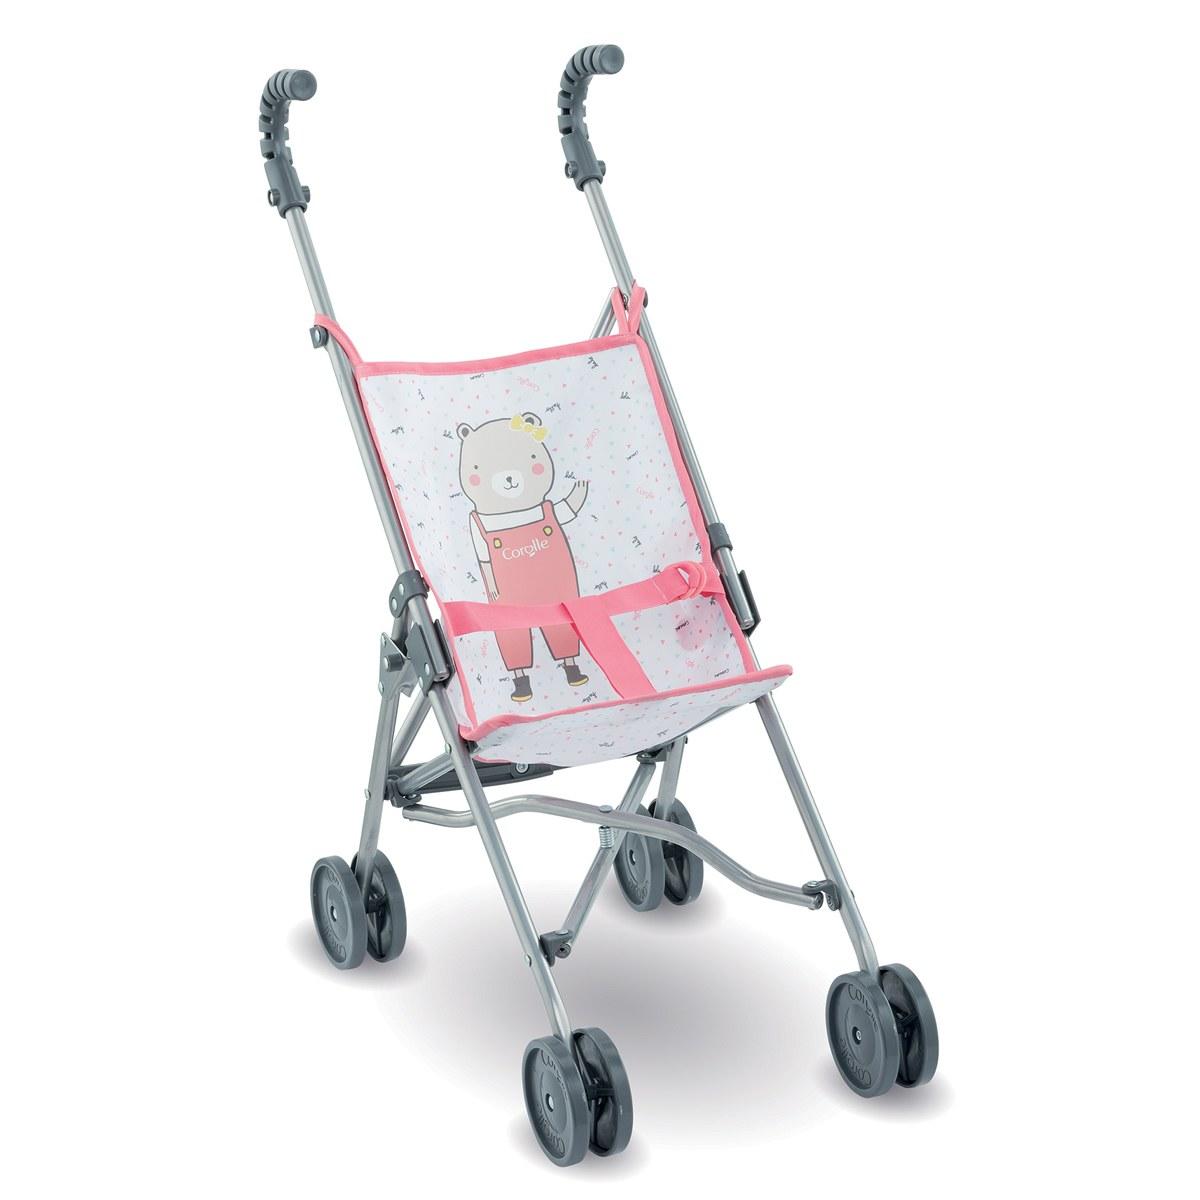 Corolle Umbrella Doll Stroller - Pink - Inspired by Stroller